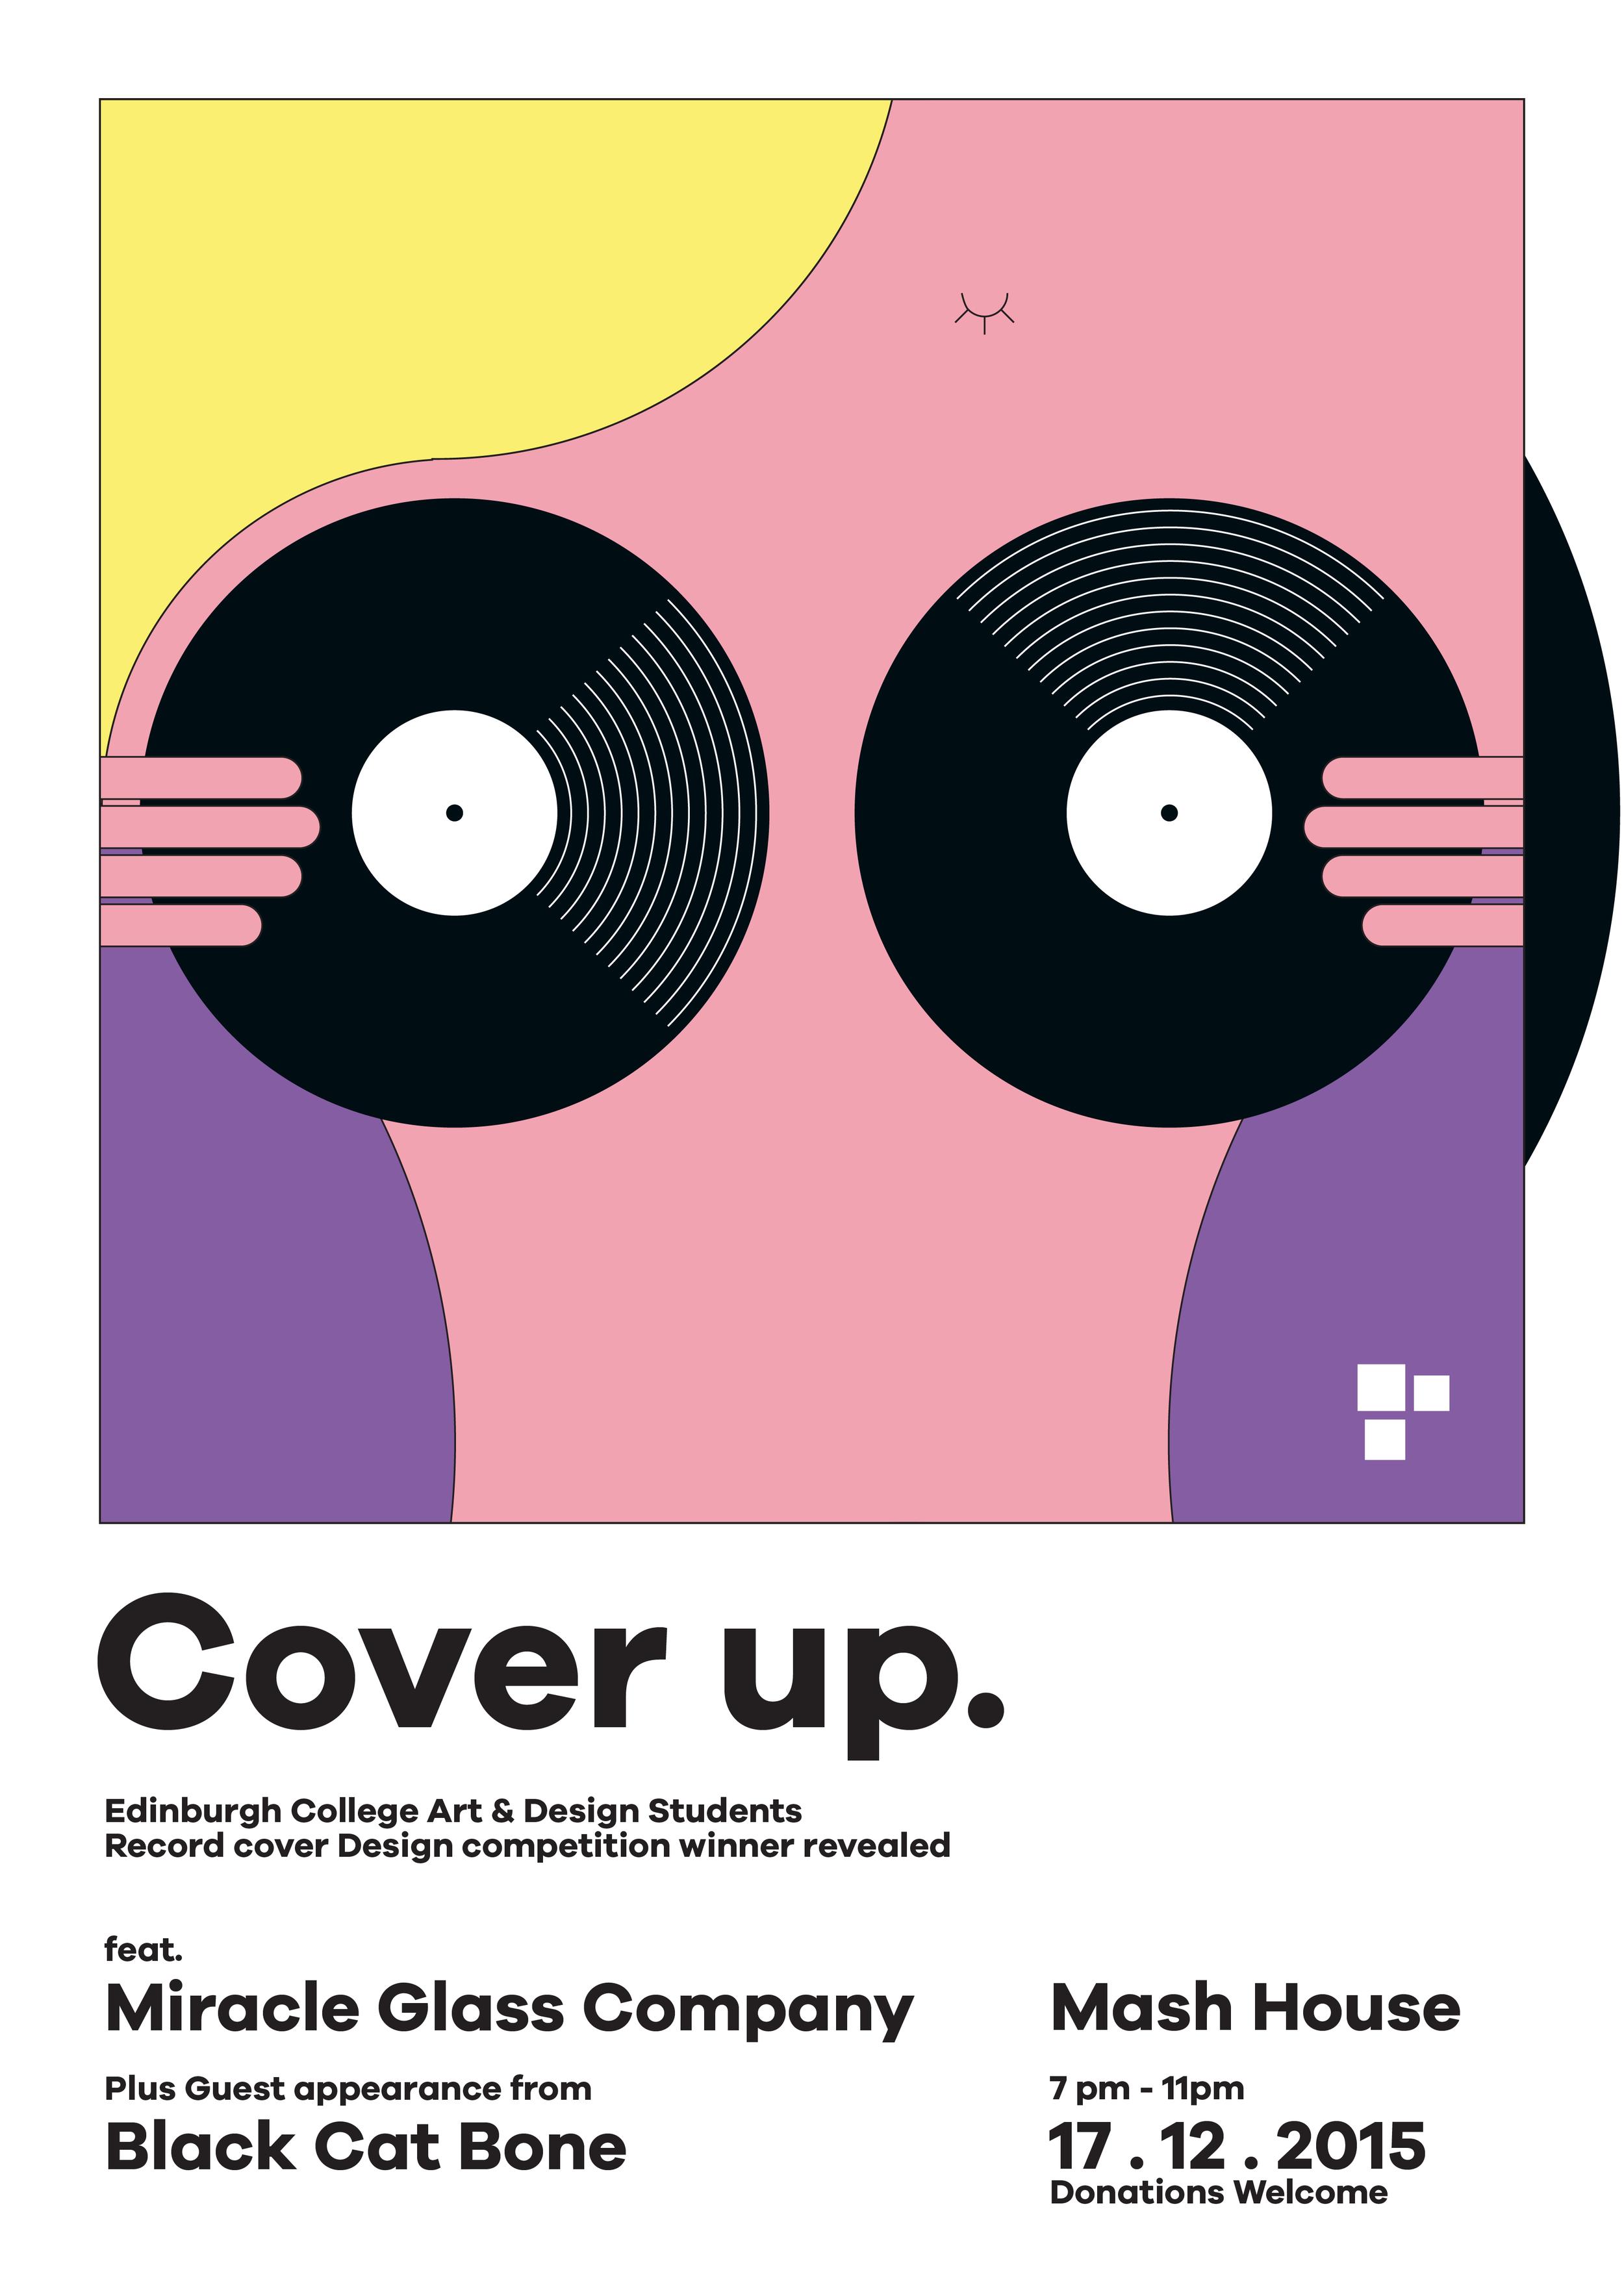 cover up-02.jpg